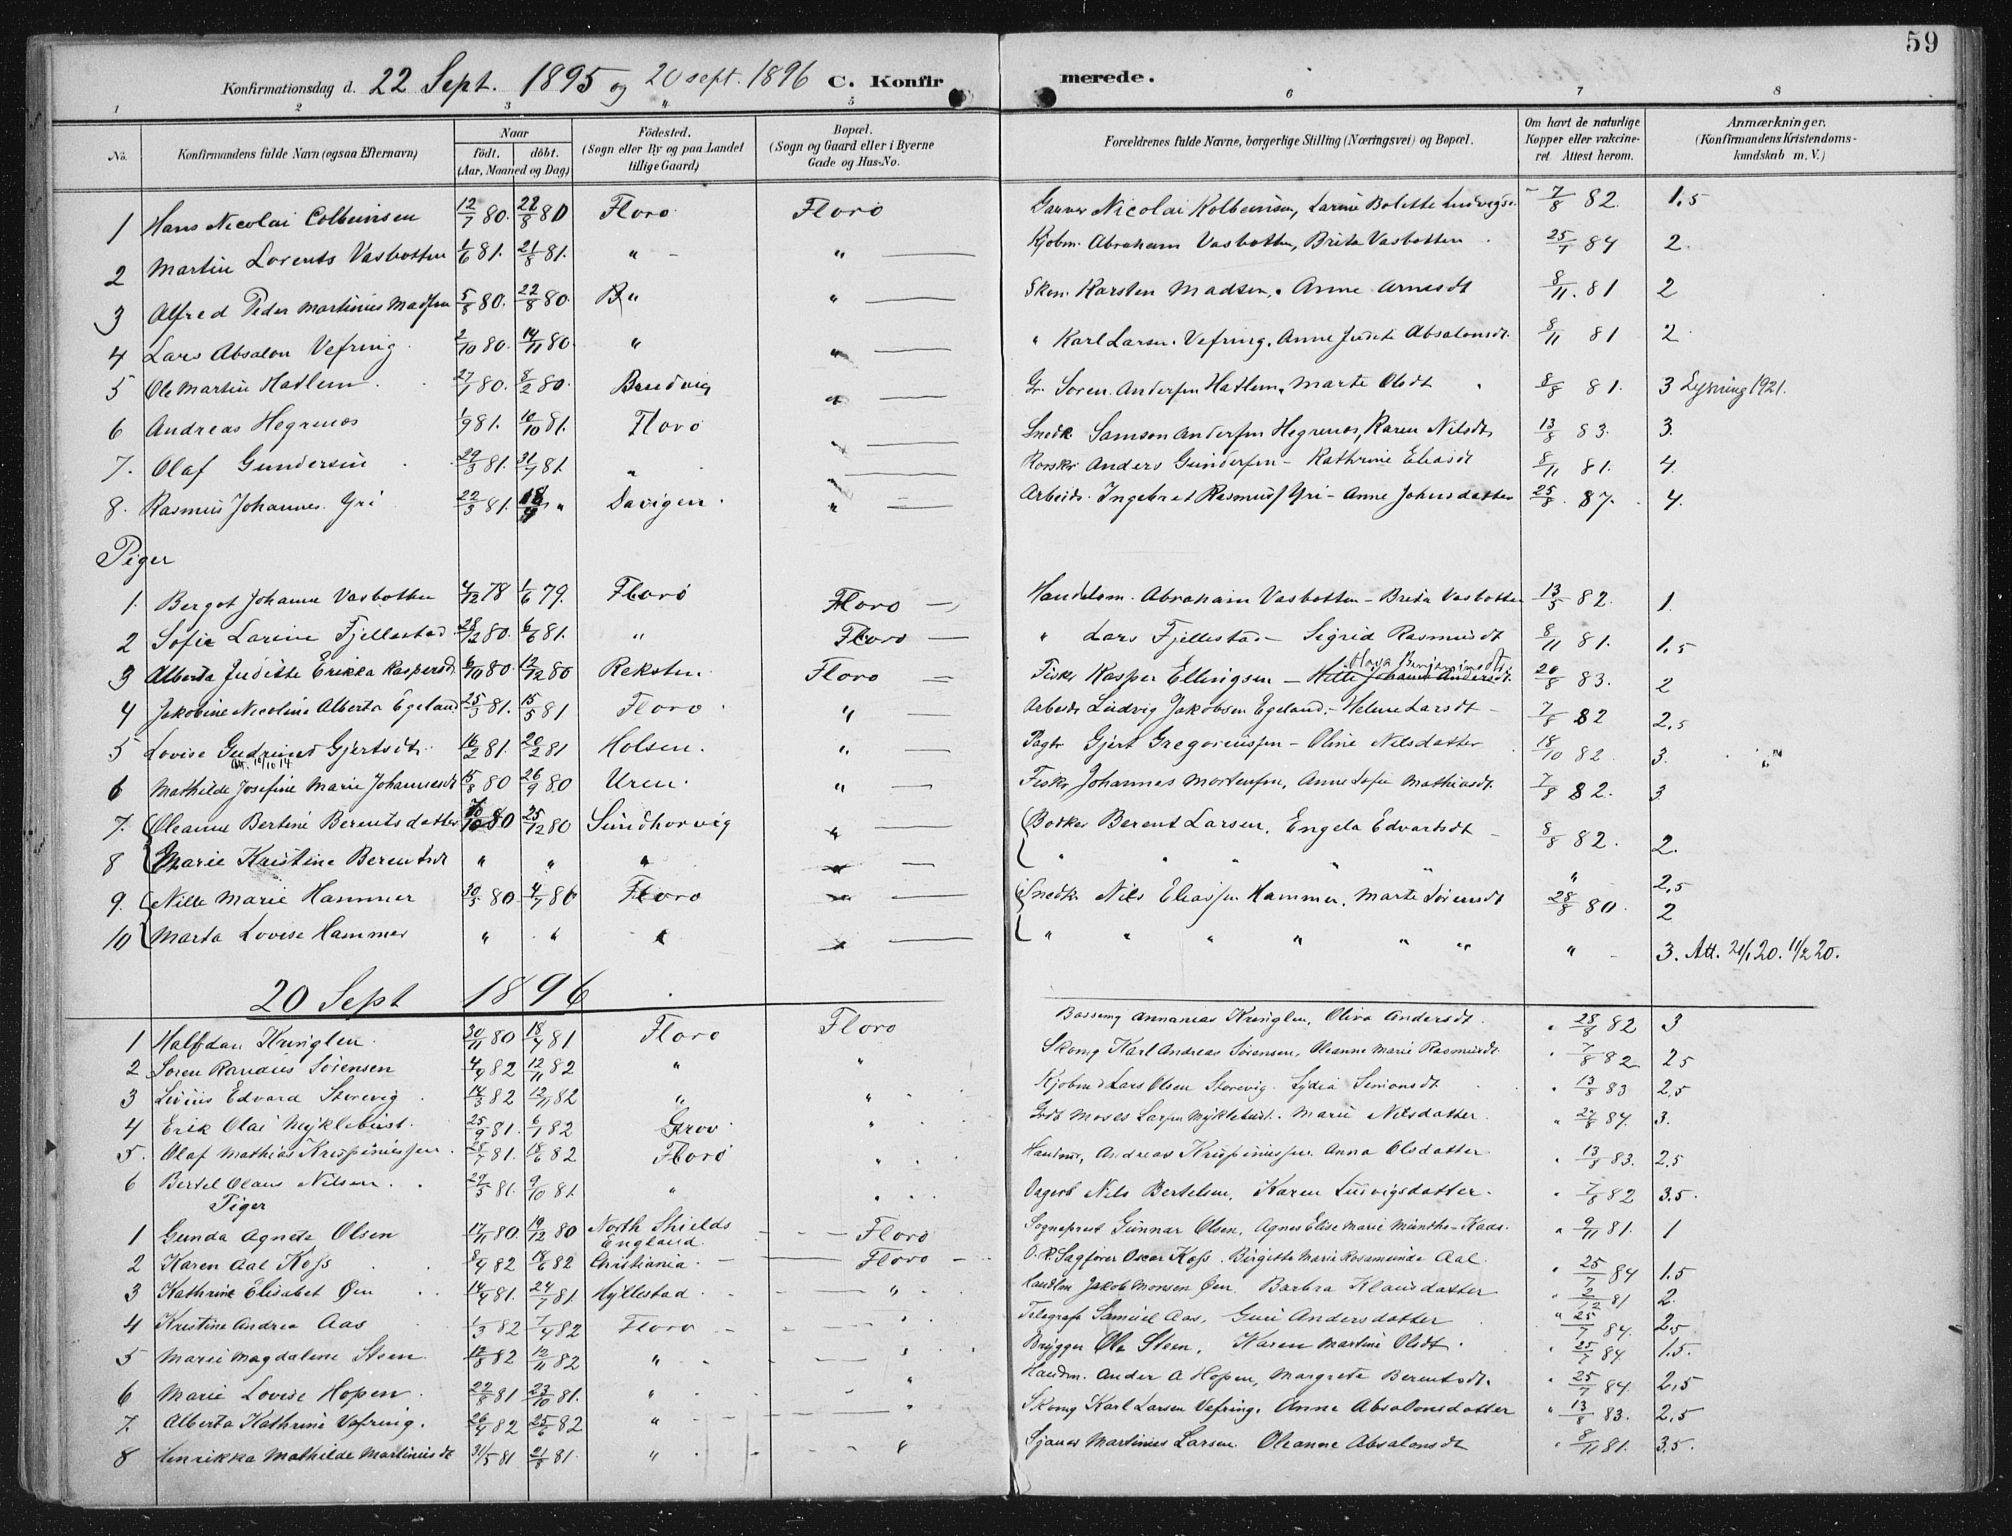 SAB, Kinn sokneprestembete, H/Haa/Haac/L0002: Ministerialbok nr. C  2, 1895-1916, s. 59